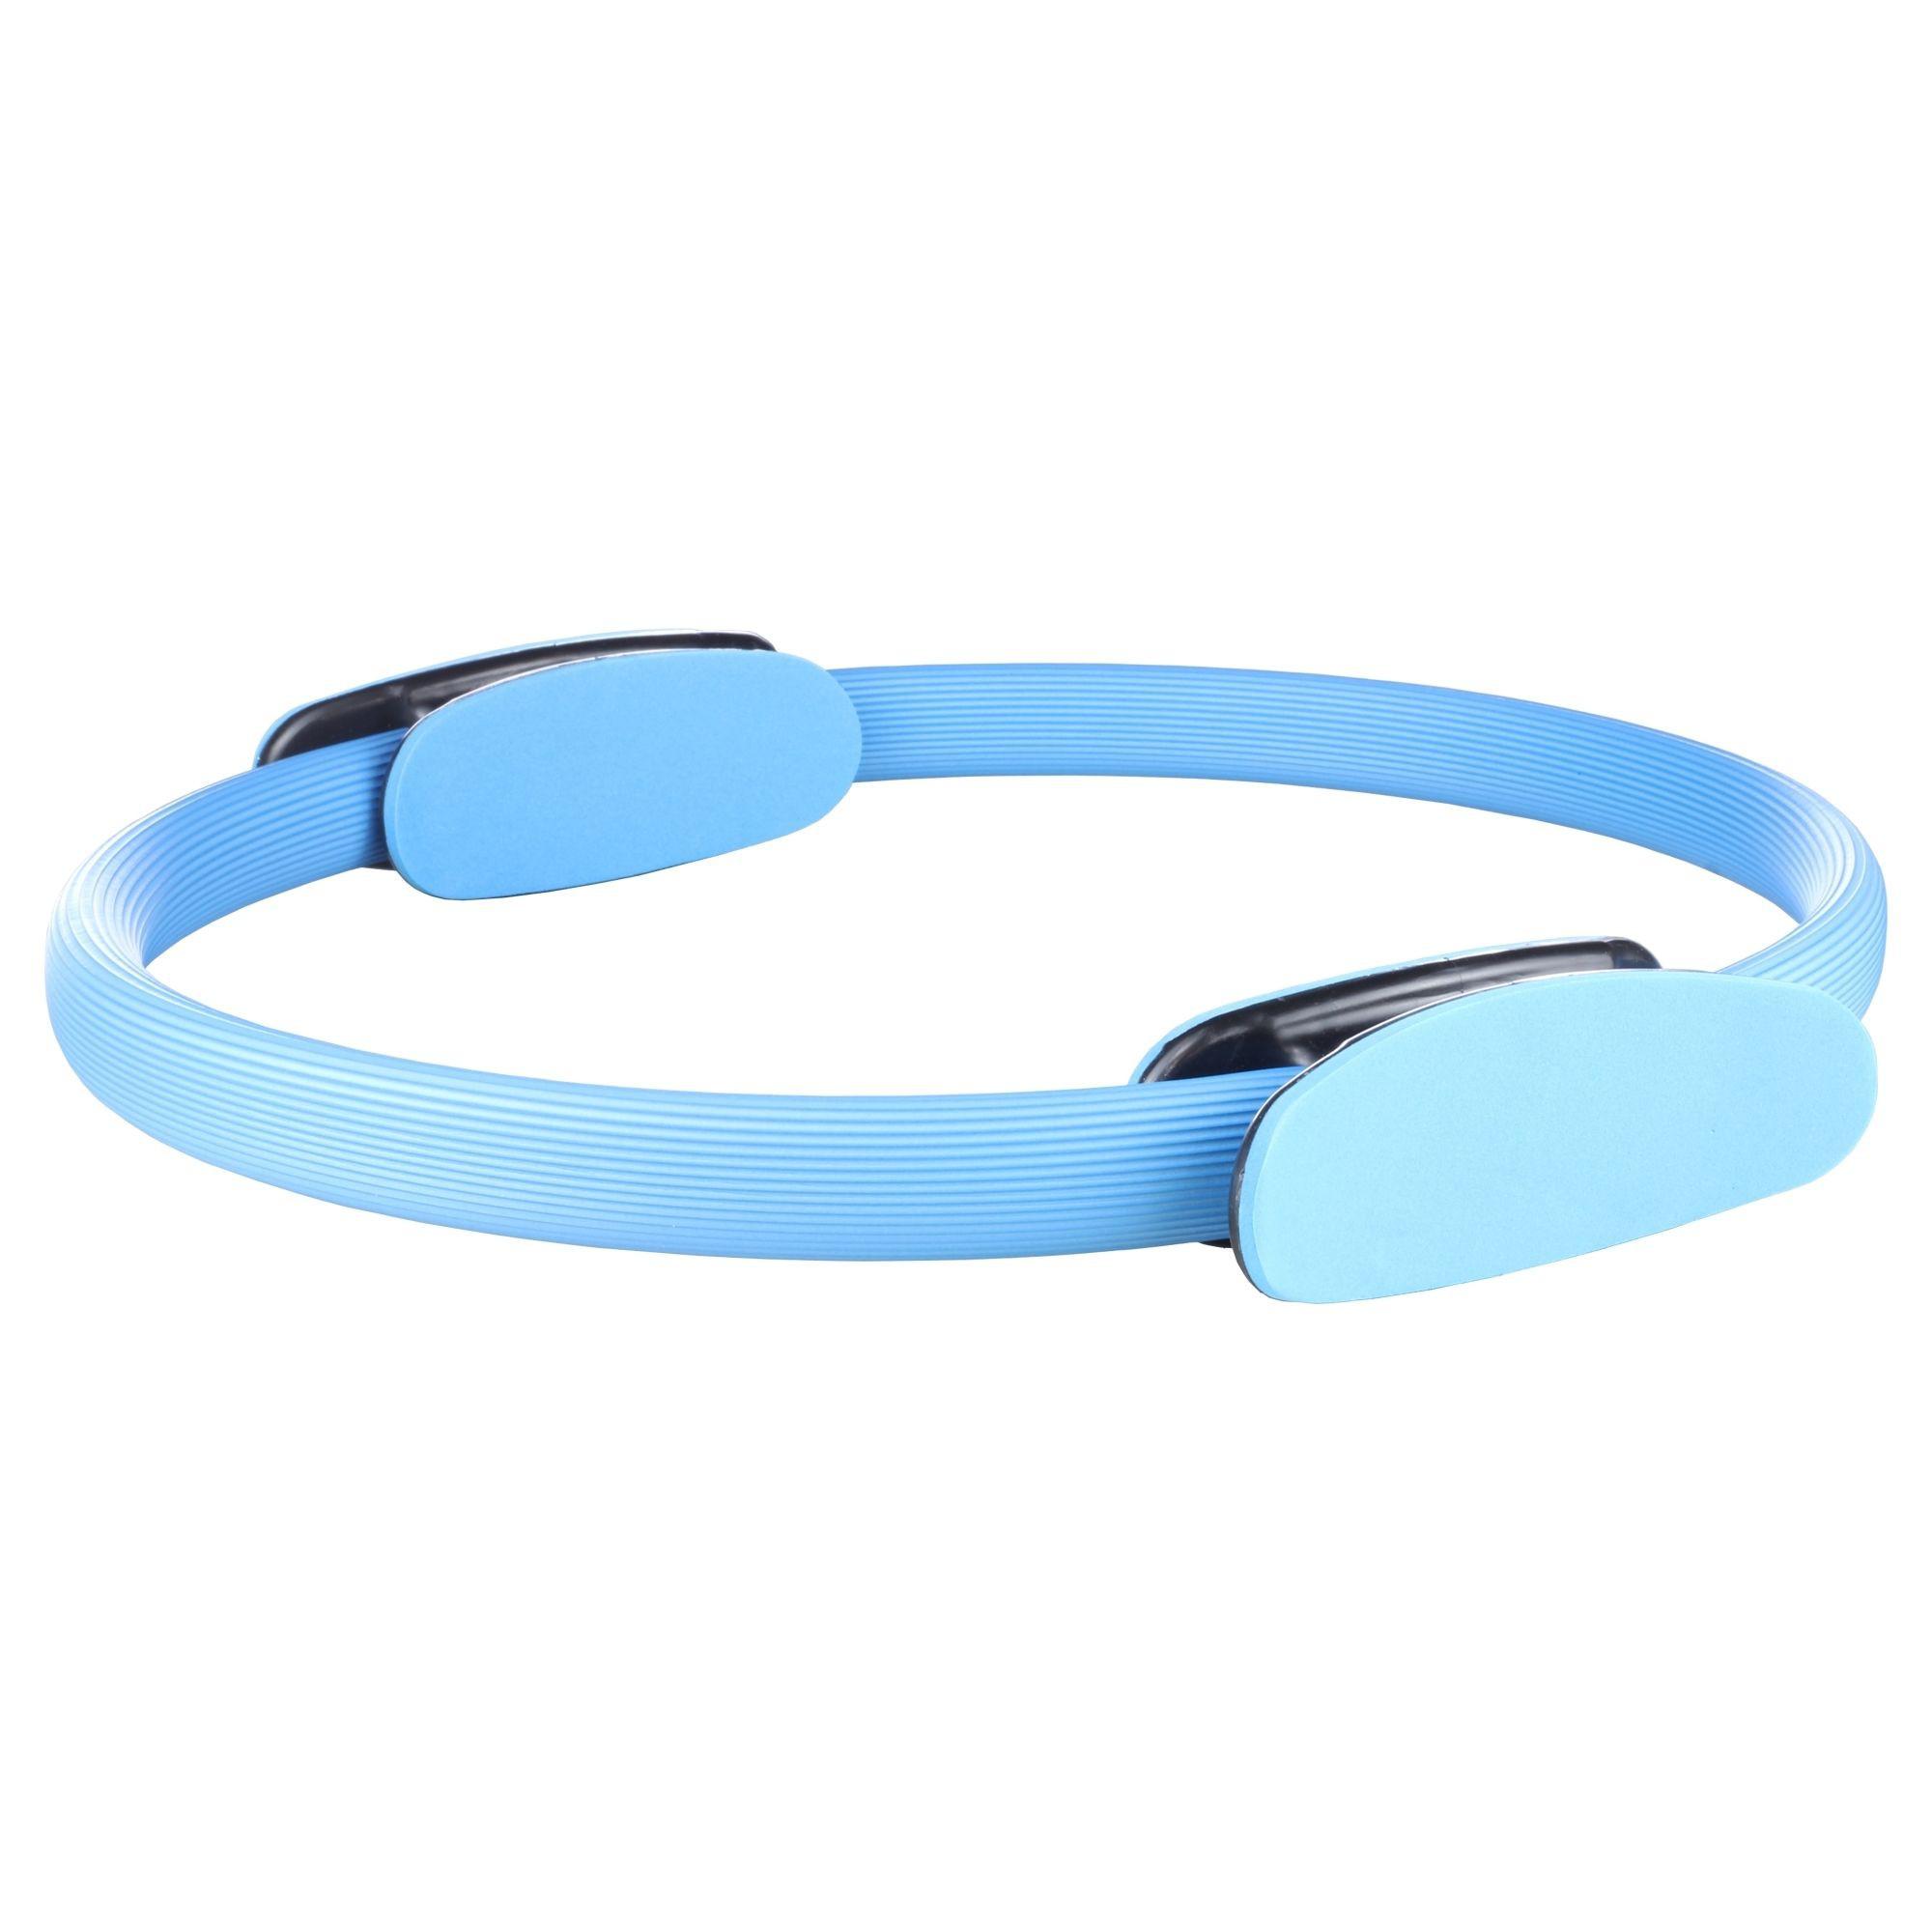 Anel Arco de Pilates - Pilates Ring Azul